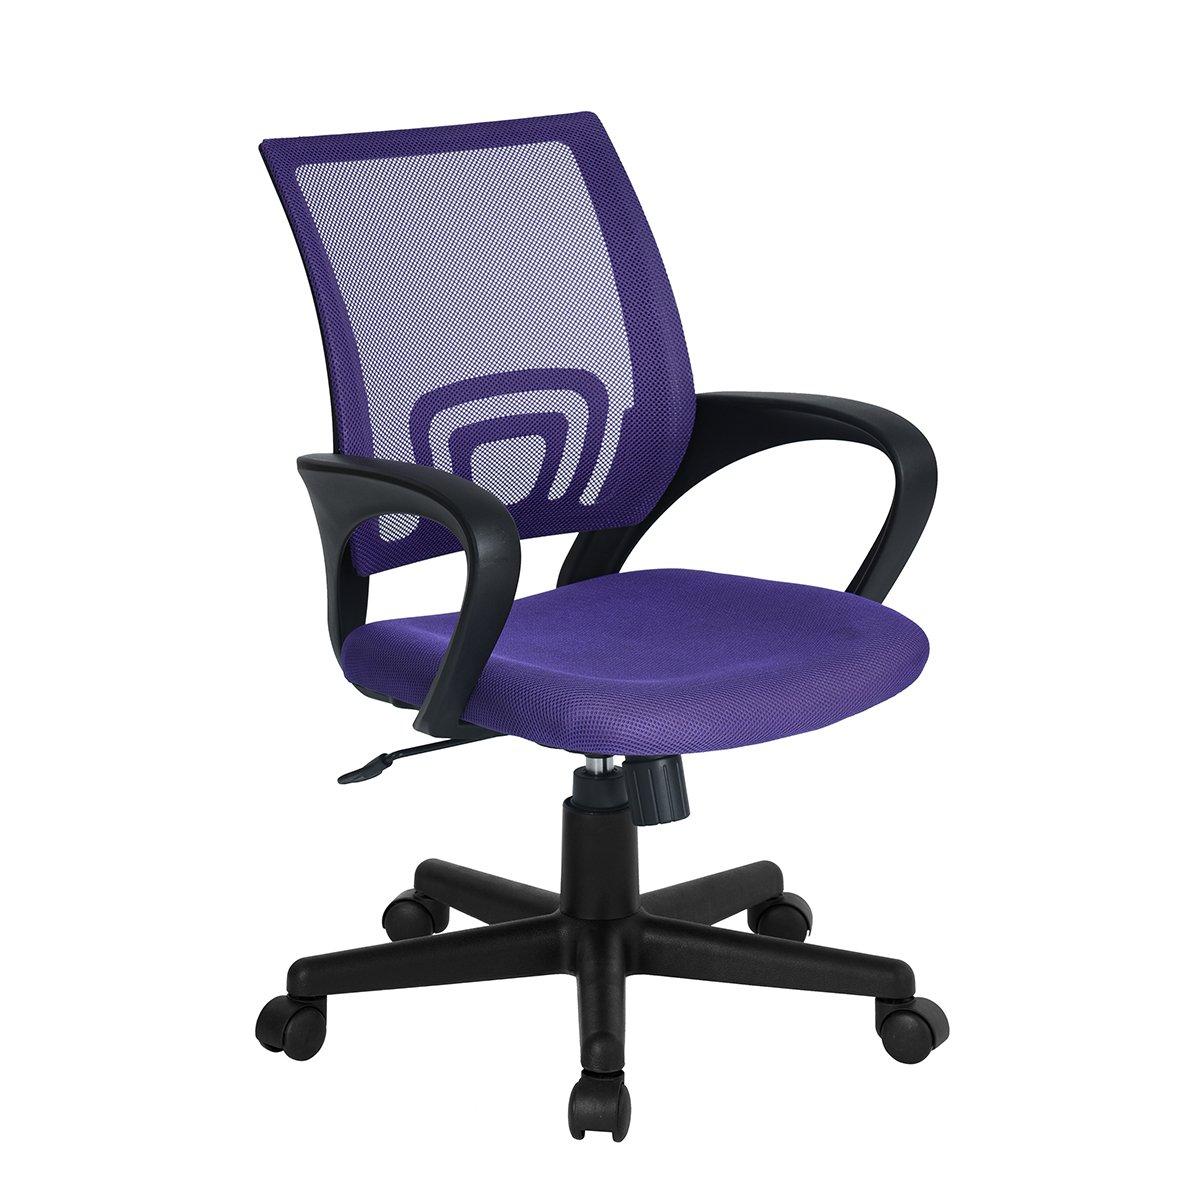 Ihouse Height Adjustable Midback Mesh Ergonomic Computer Office Swivel Desk Chair With Armrest,Purple